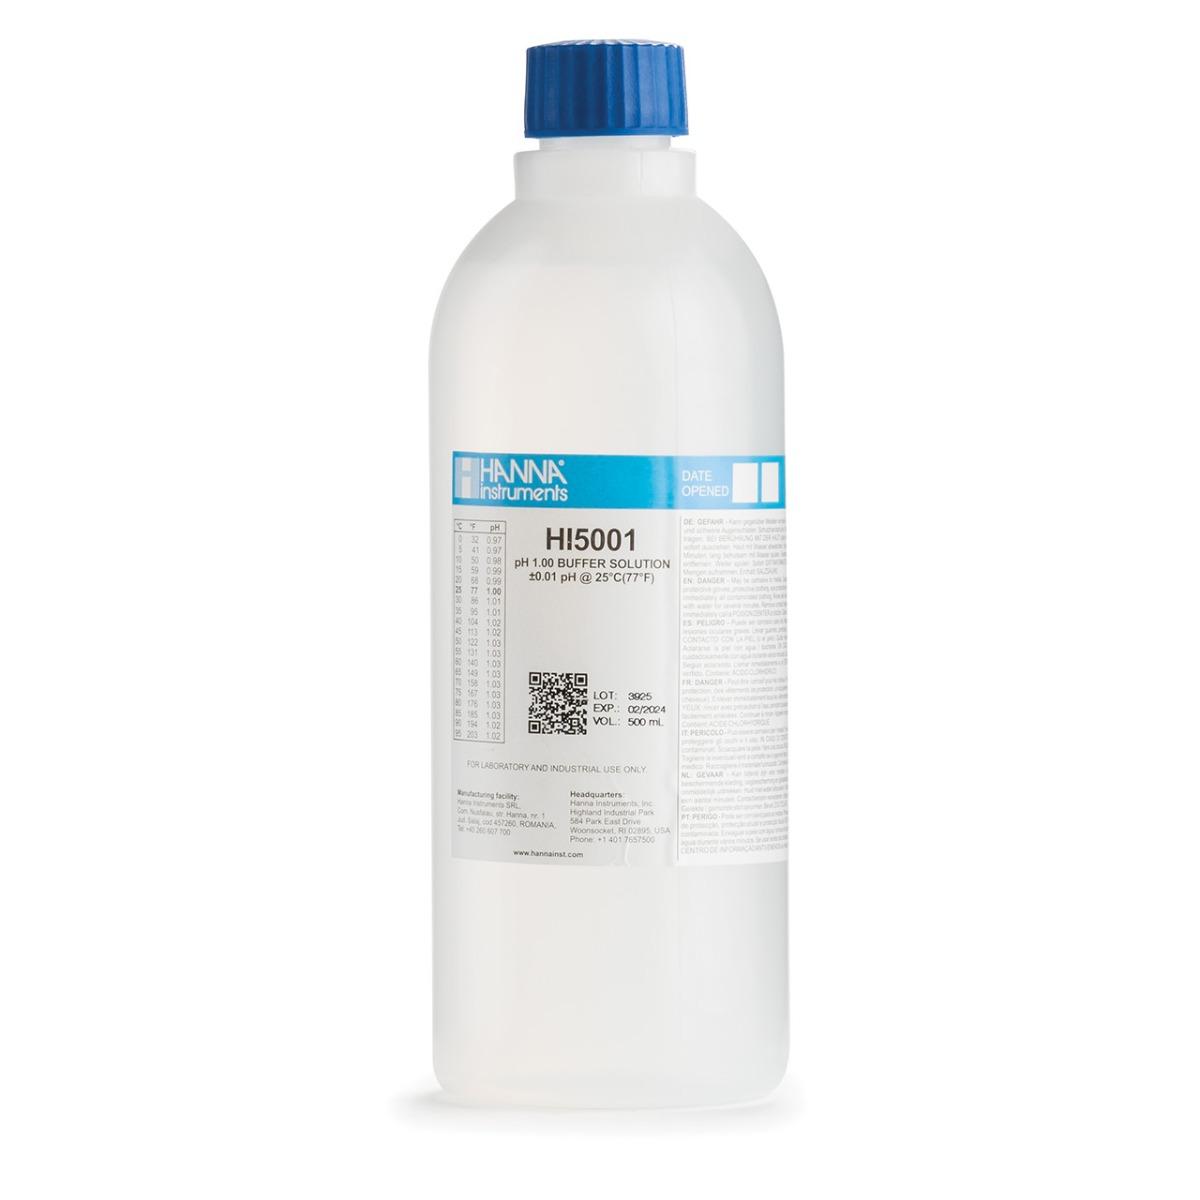 HI5001 pH 1.00 Technical Calibration Buffer (500 mL)